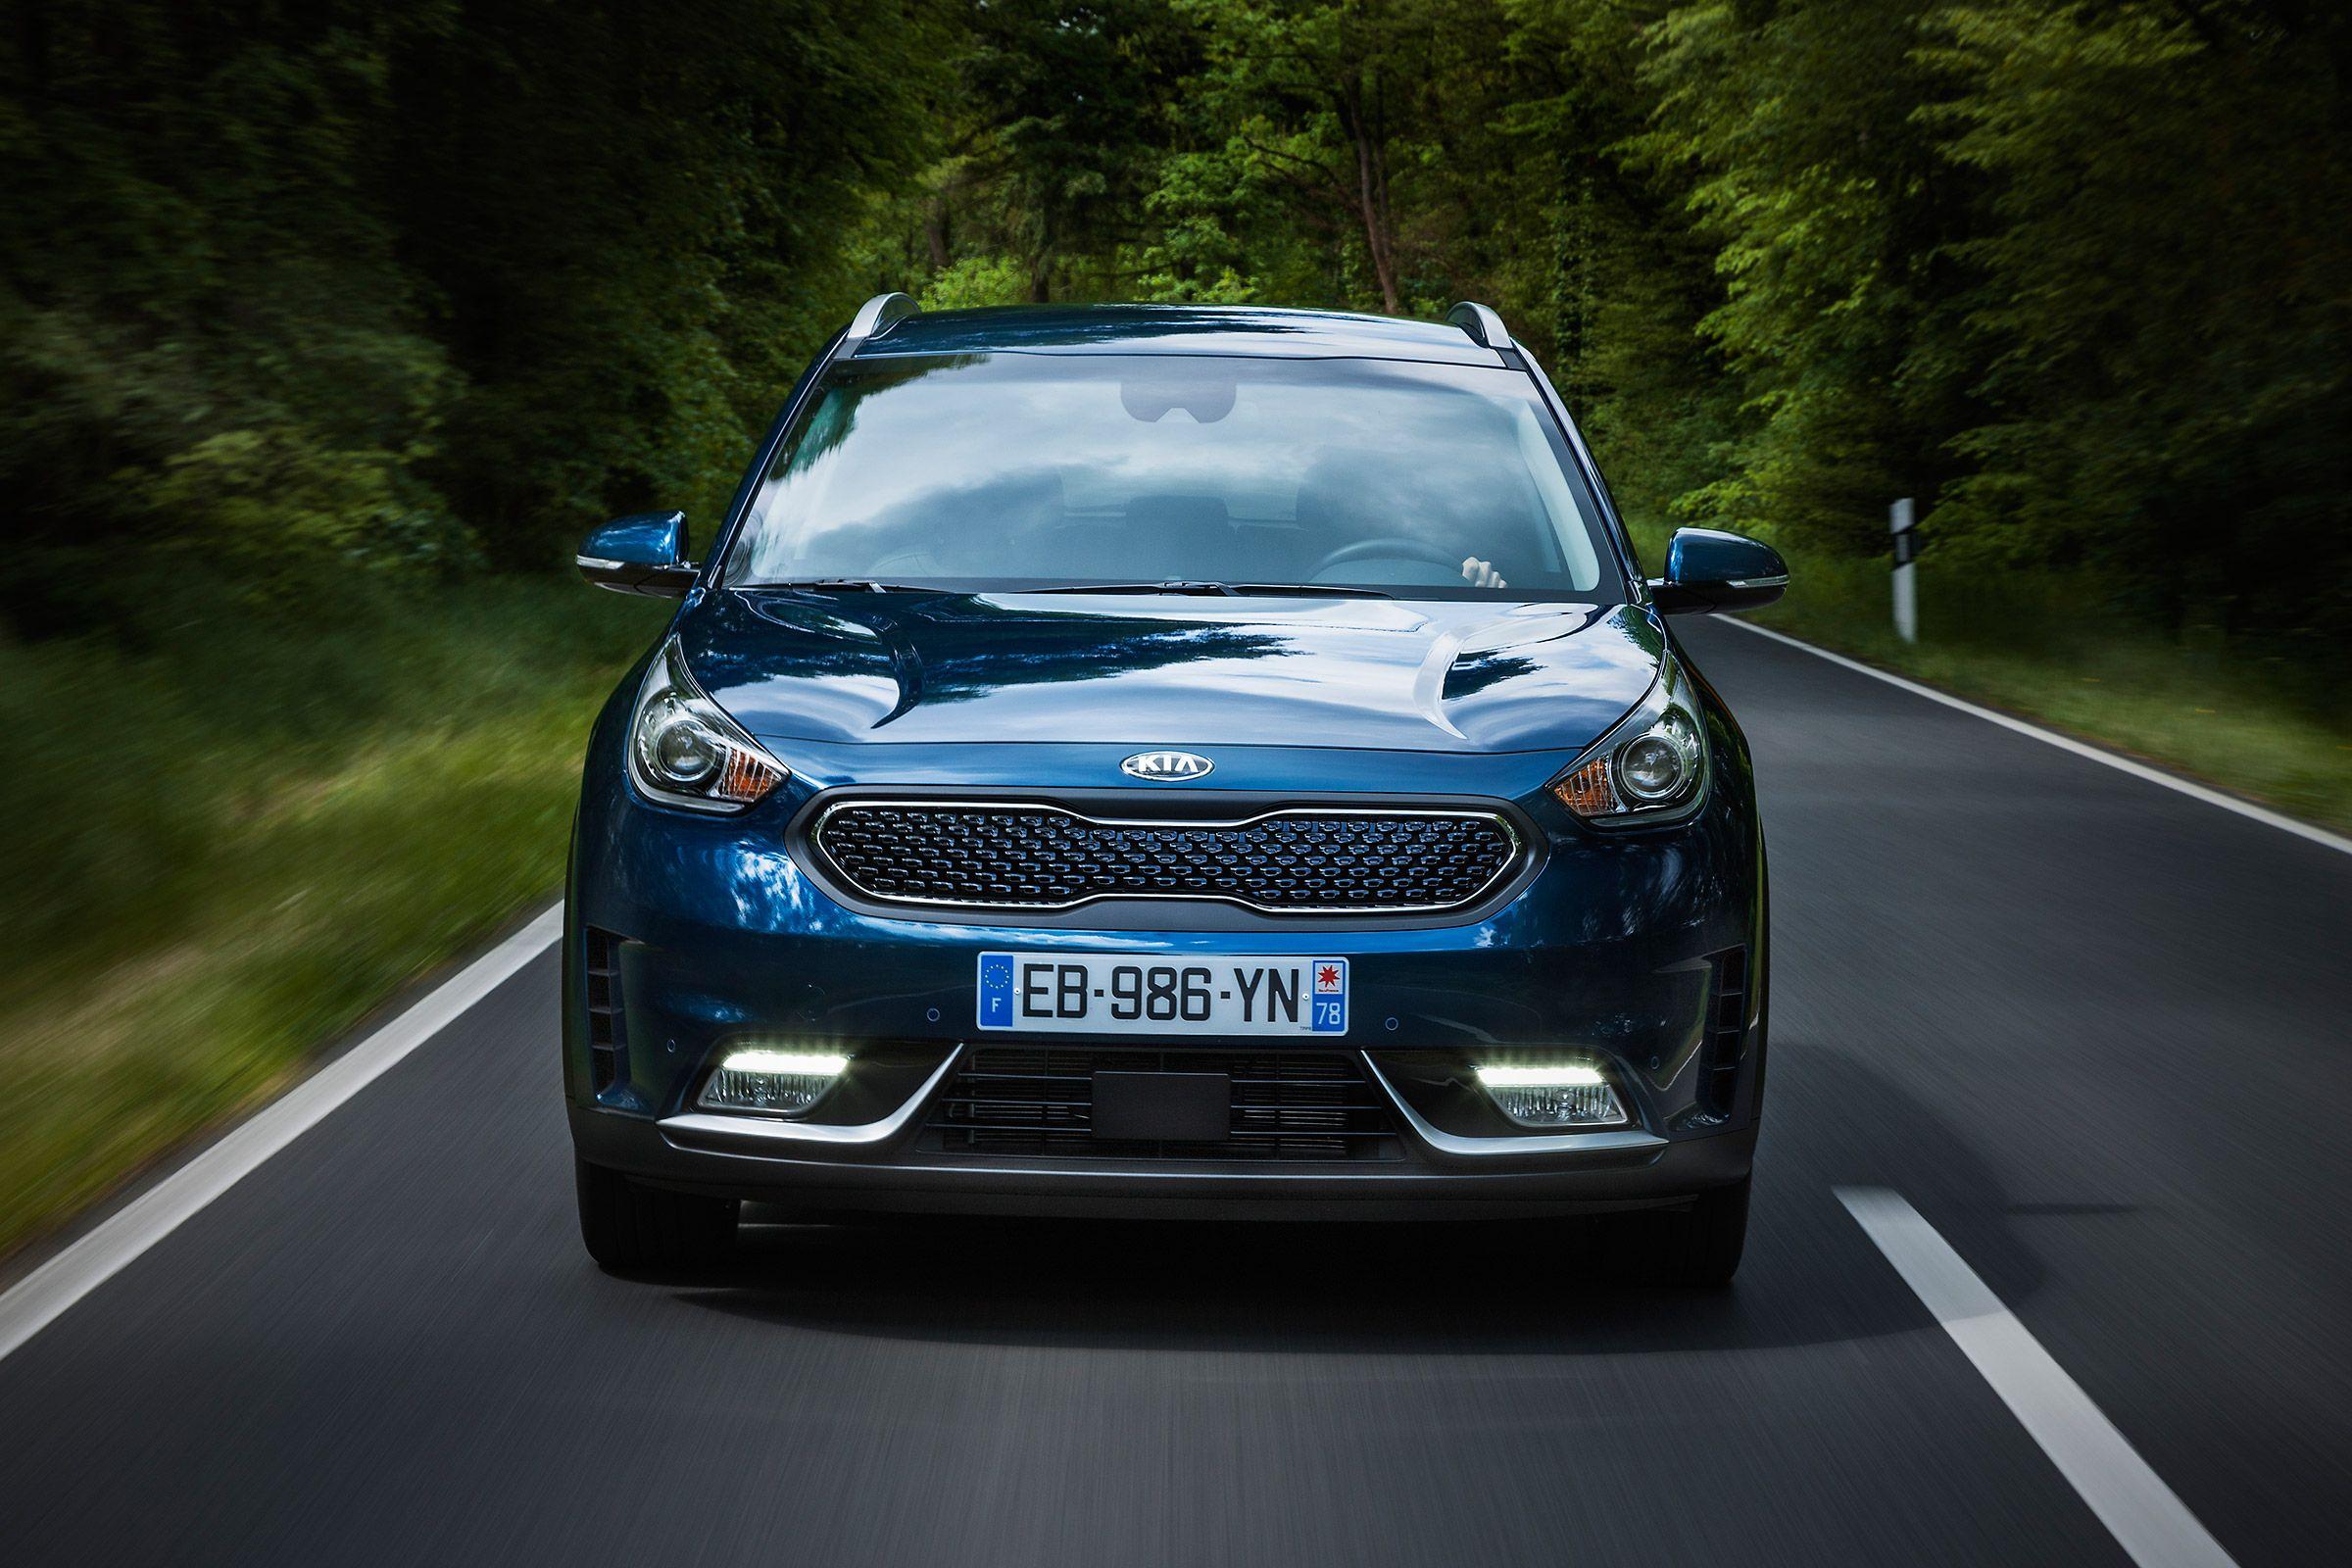 Kia preparing new hydrogen fuel cell car